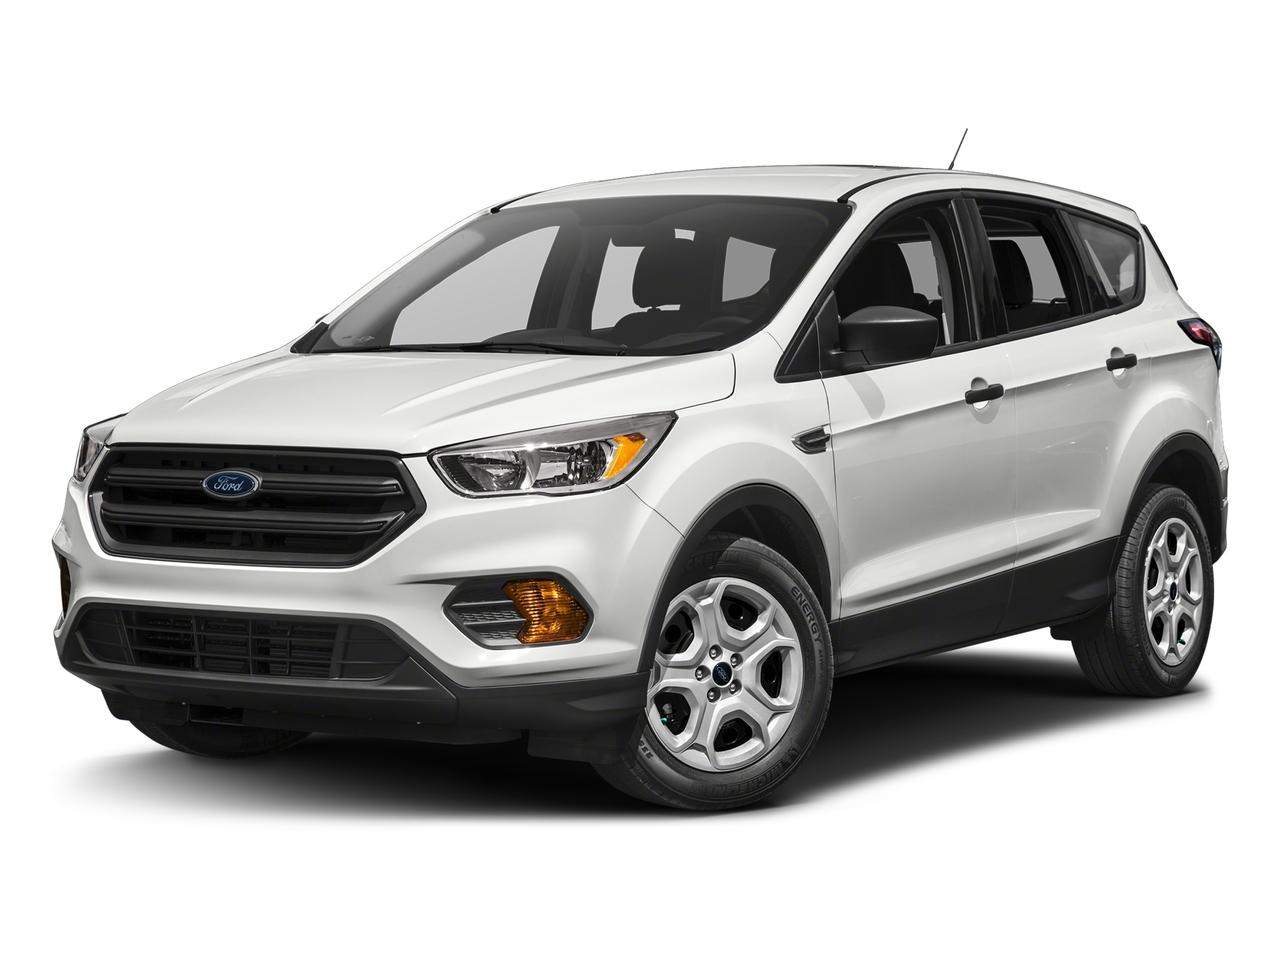 2017 Ford Escape Vehicle Photo in Corpus Christi, TX 78410-4506